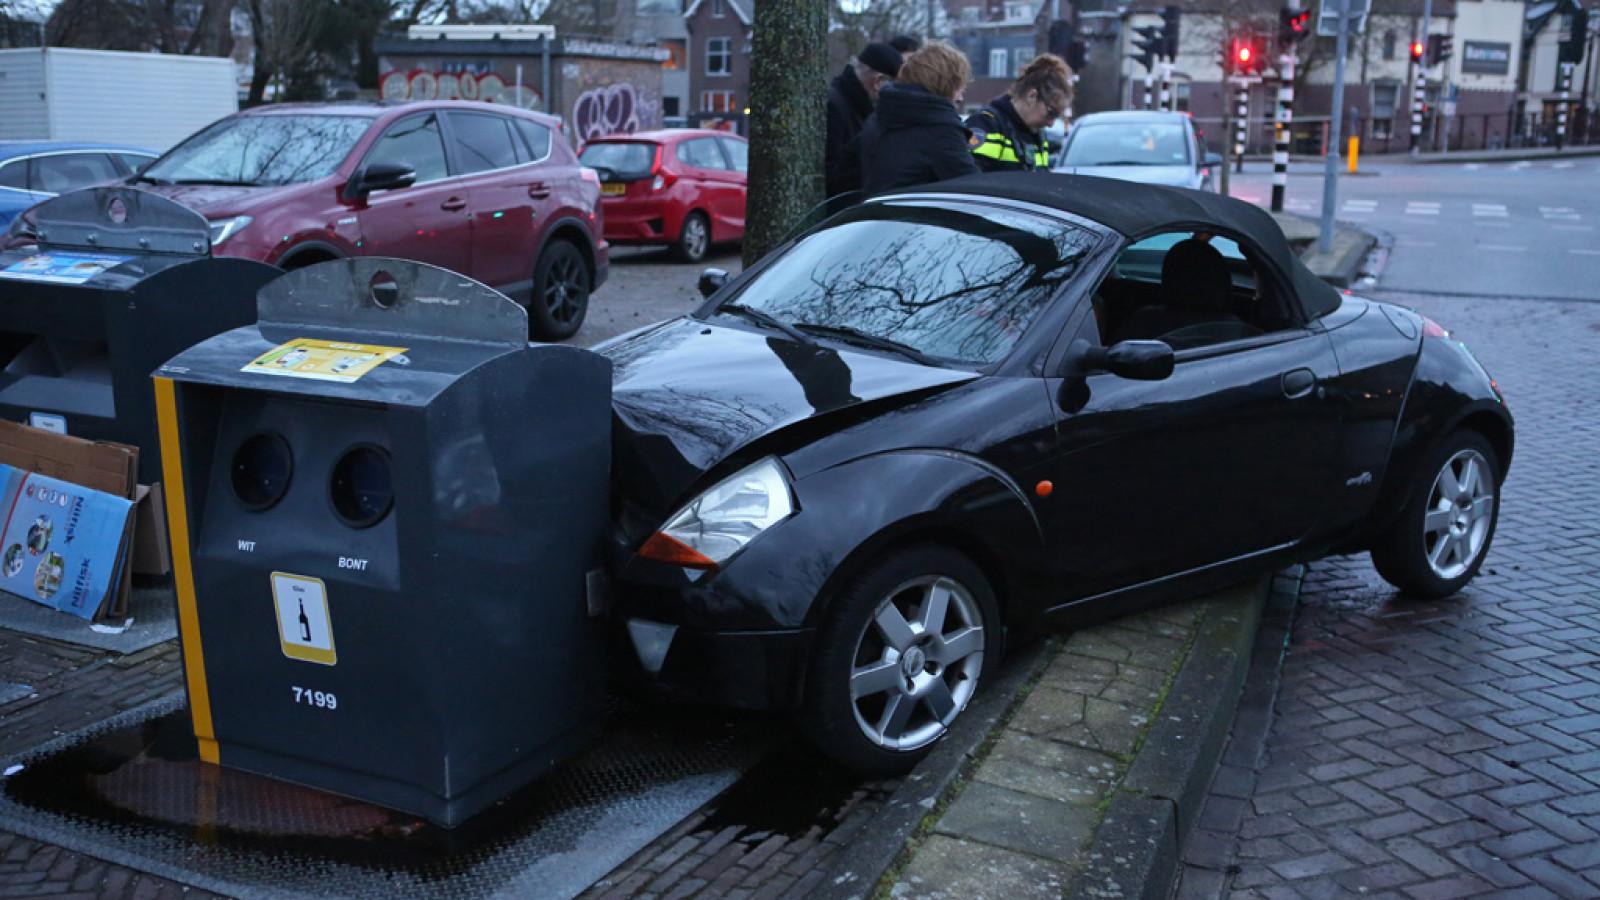 Auto knalt tegen container na botsing met andere auto.